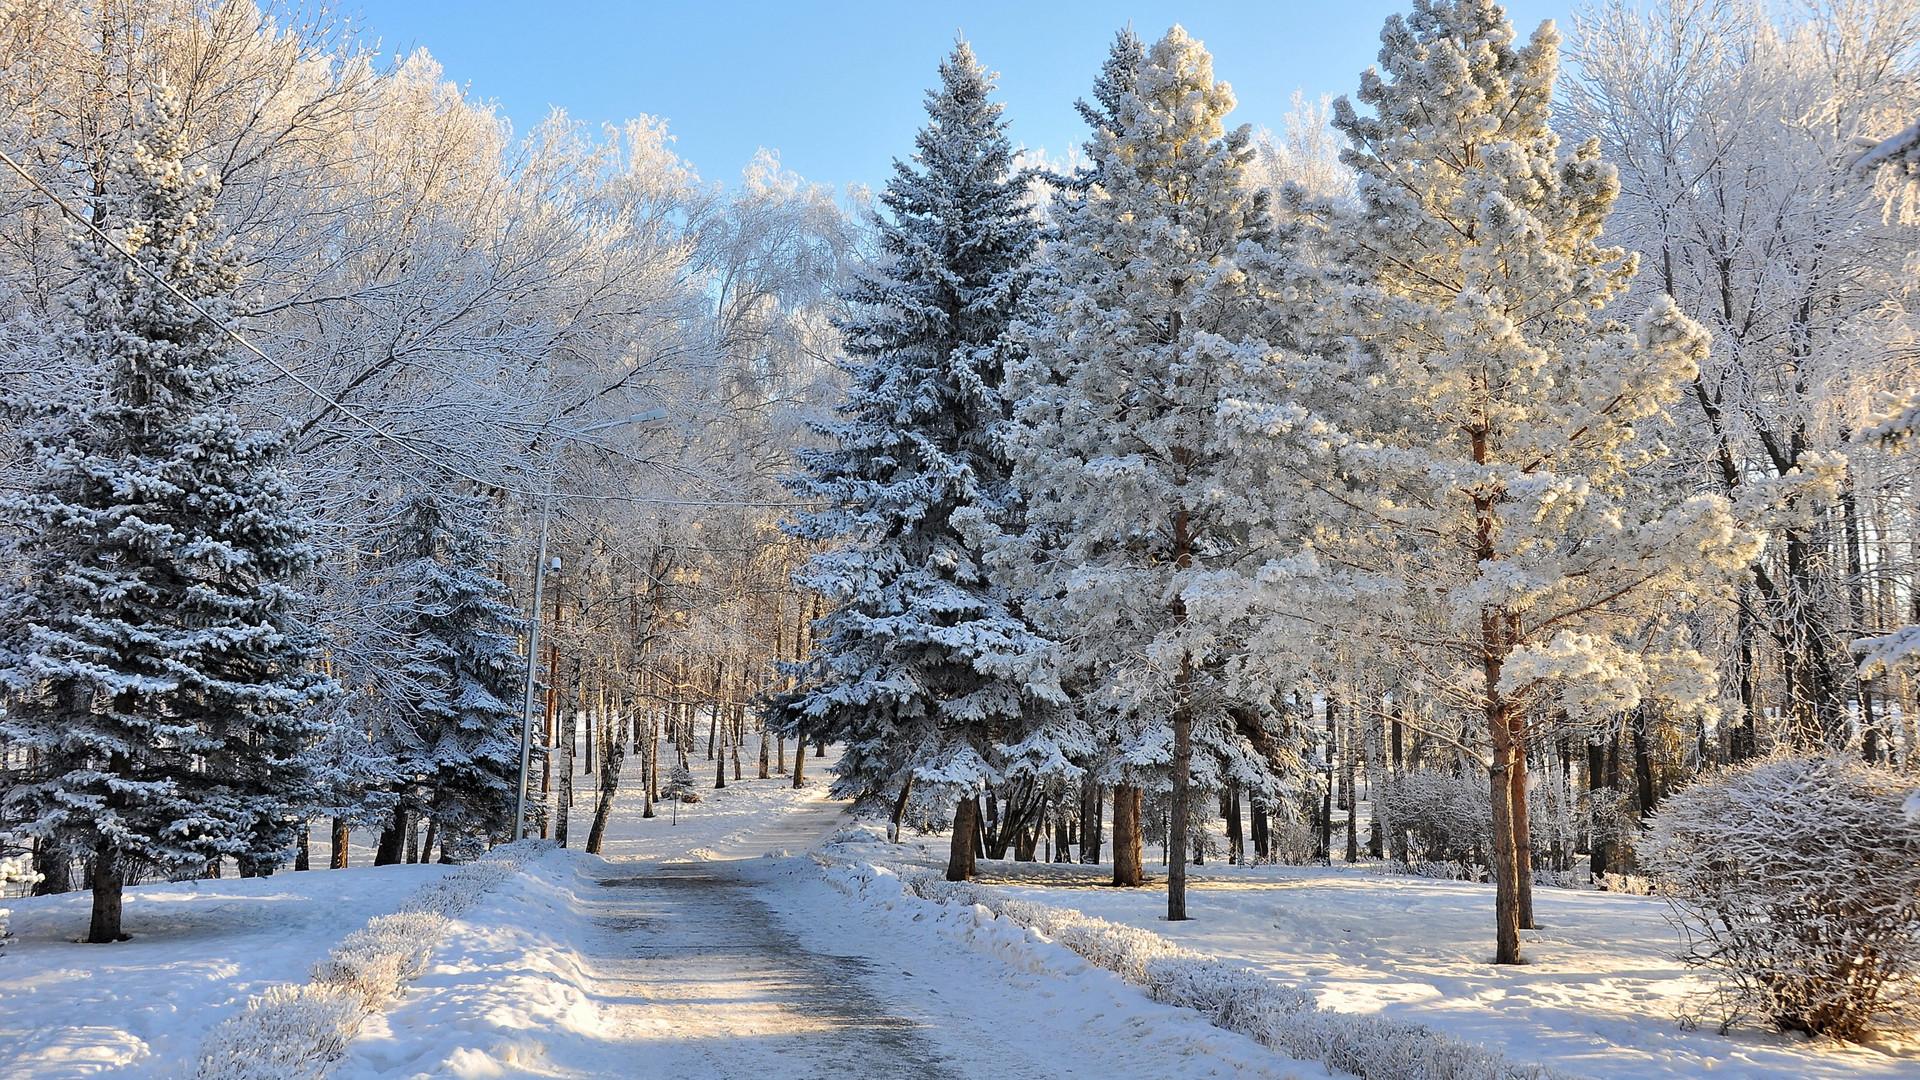 russian_winter_hd_wallpapers_14.jpg (1920×1080) | Snow Biome | Pinterest |  Wallpaper, Winter wallpapers and Petersburg russia